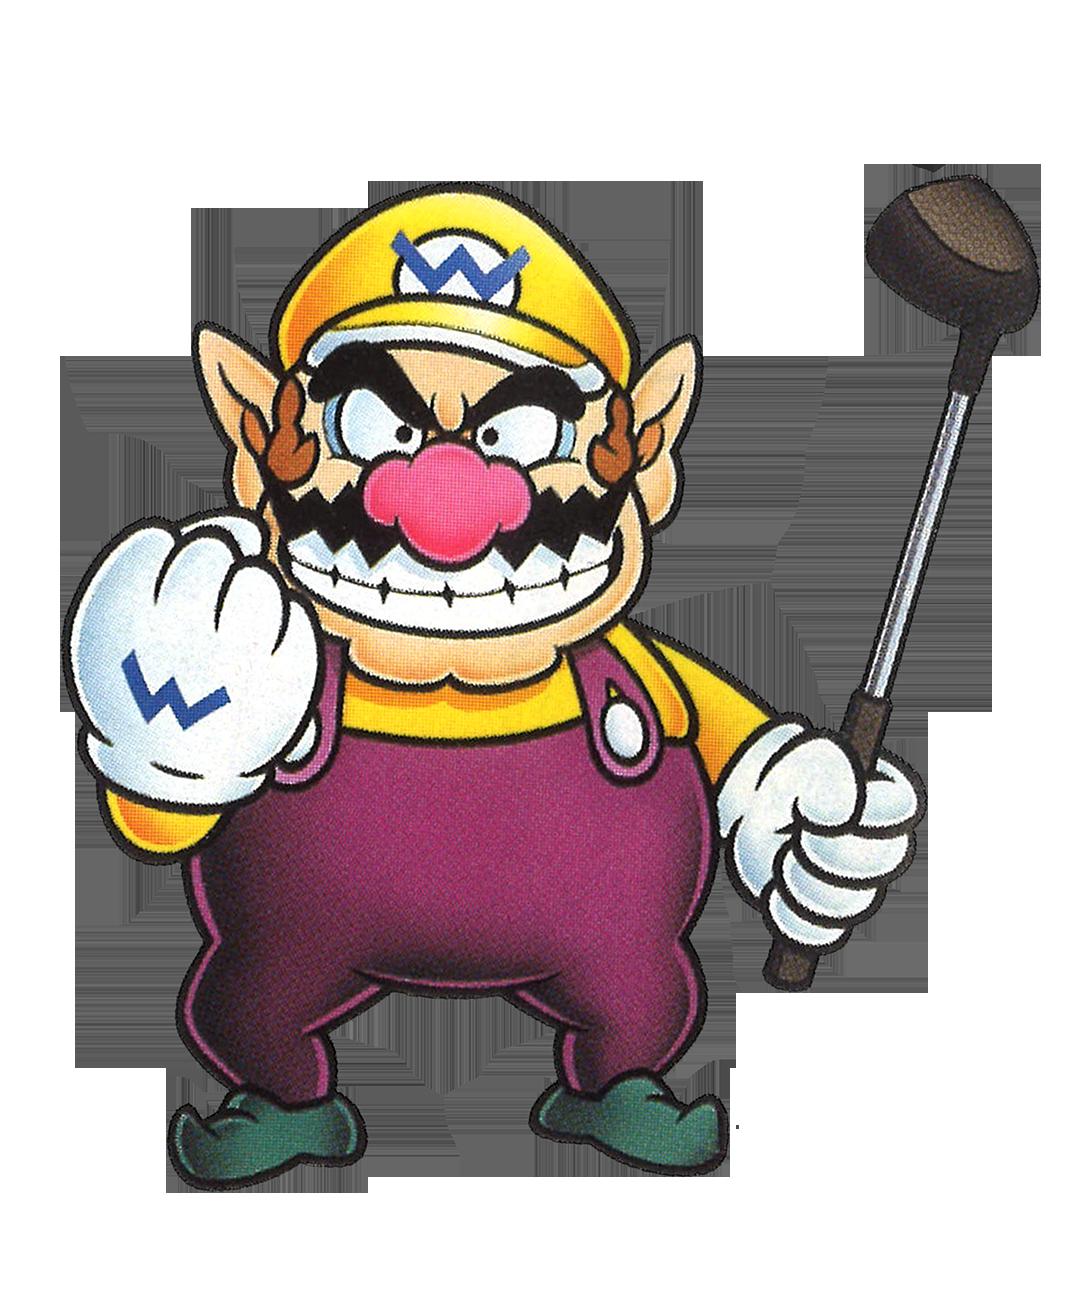 Mario clipart sad. Artwork of wario from